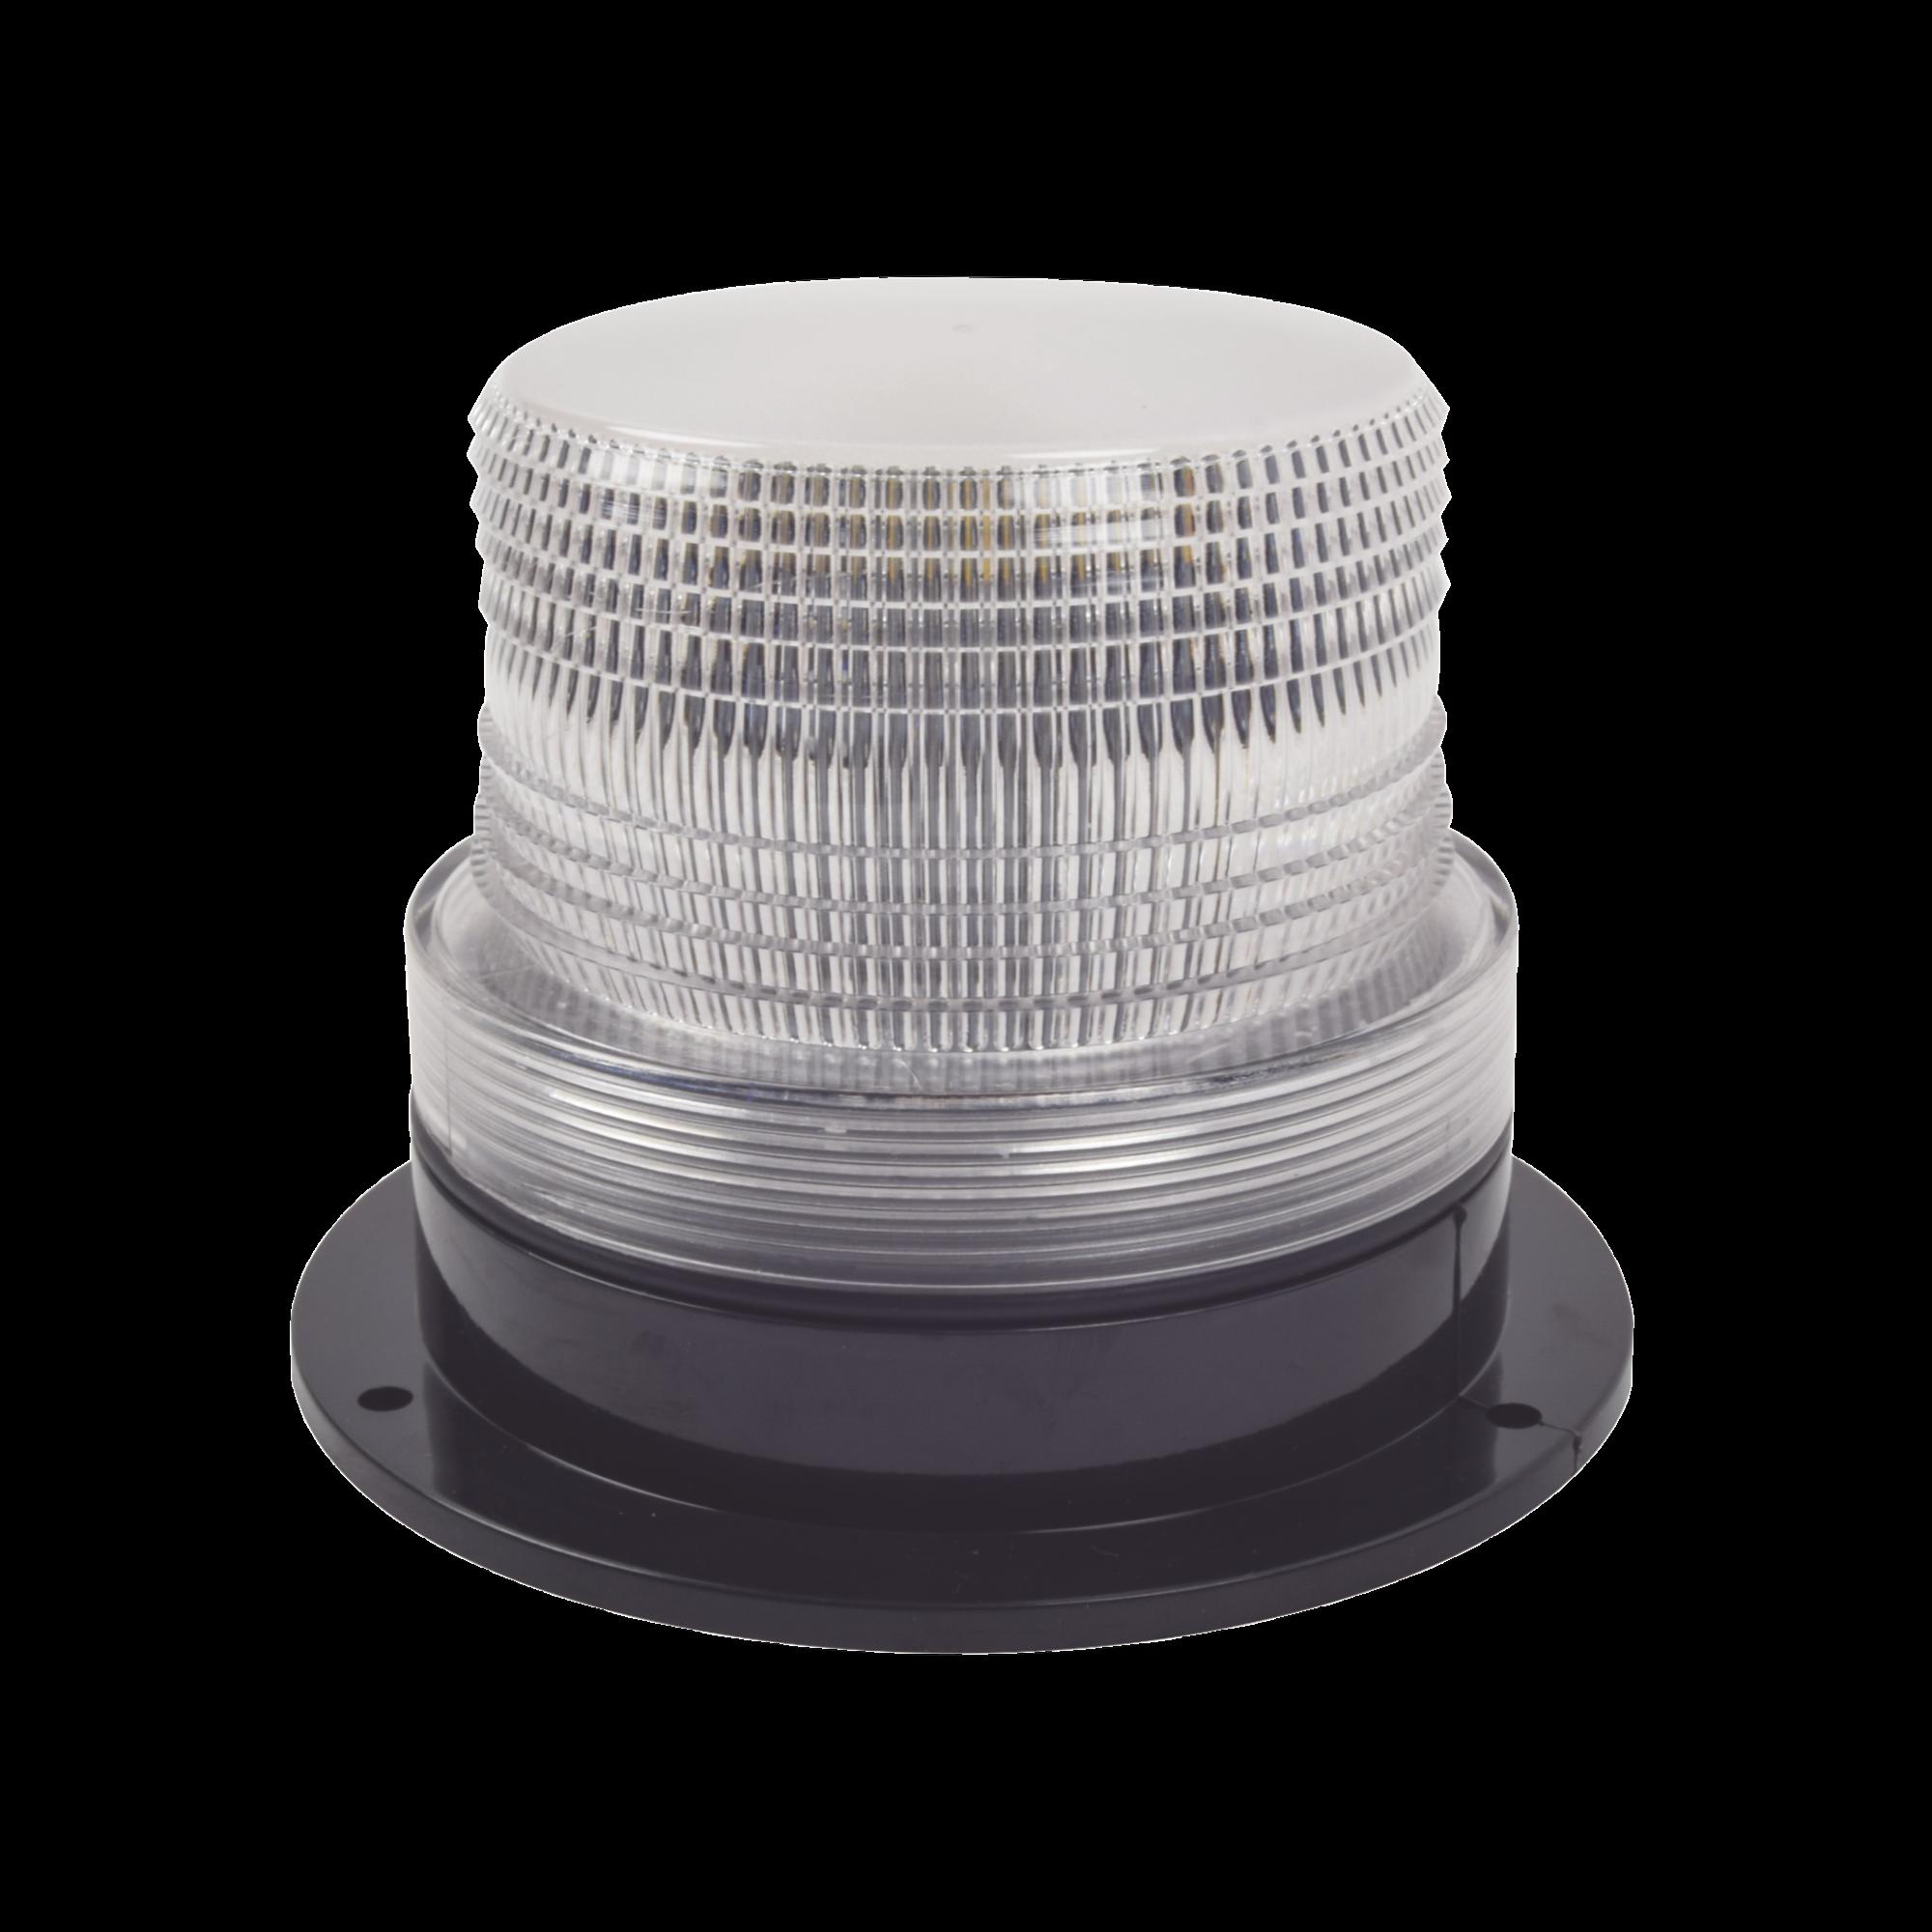 Burbuja brillante con 8 LEDs, color claro, domo claro